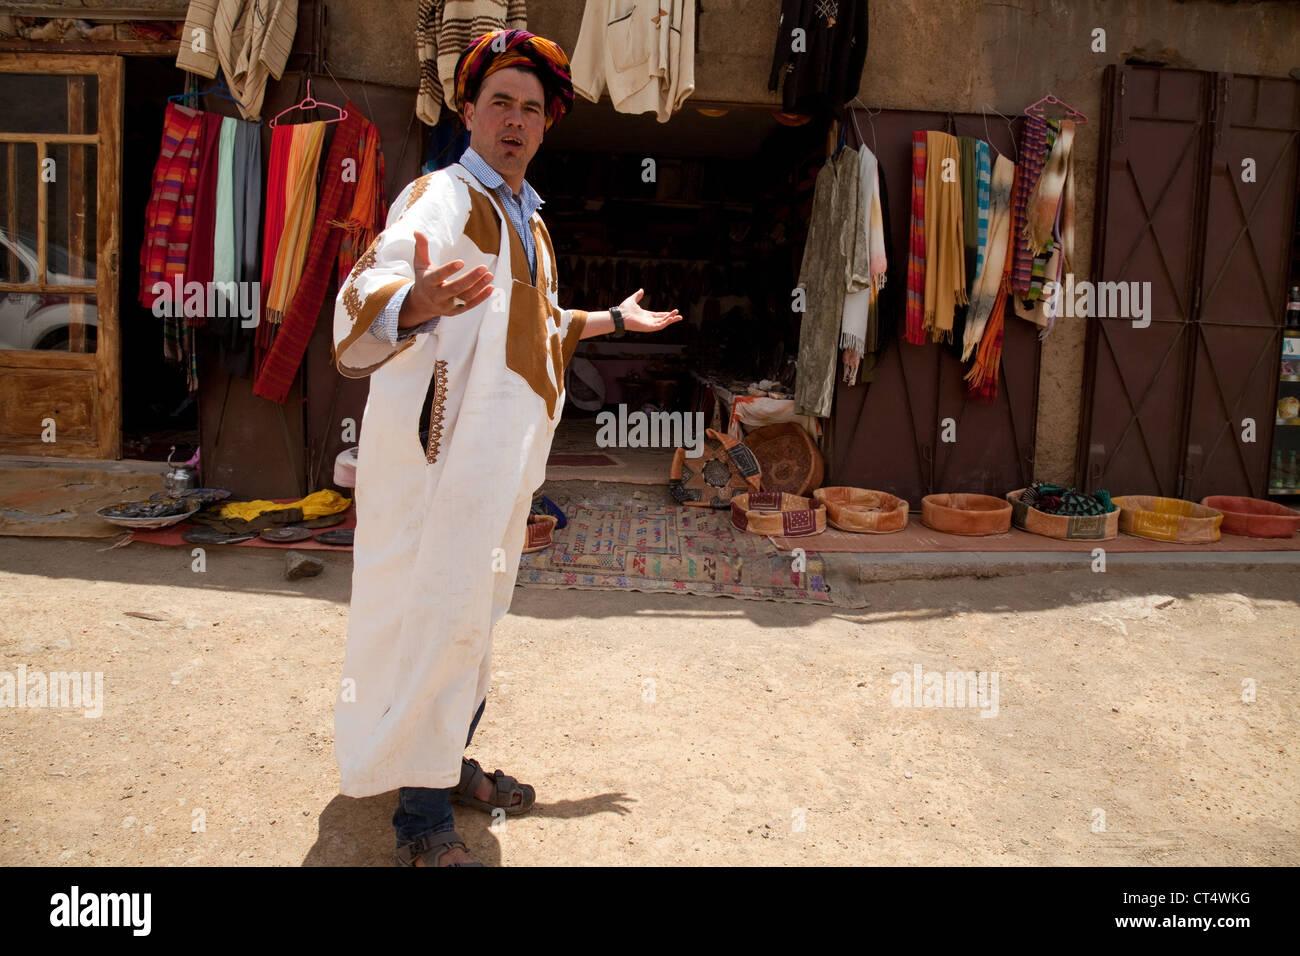 Local Berber Stallkeeper selling goods, Imlil, Morocco Africa - Stock Image